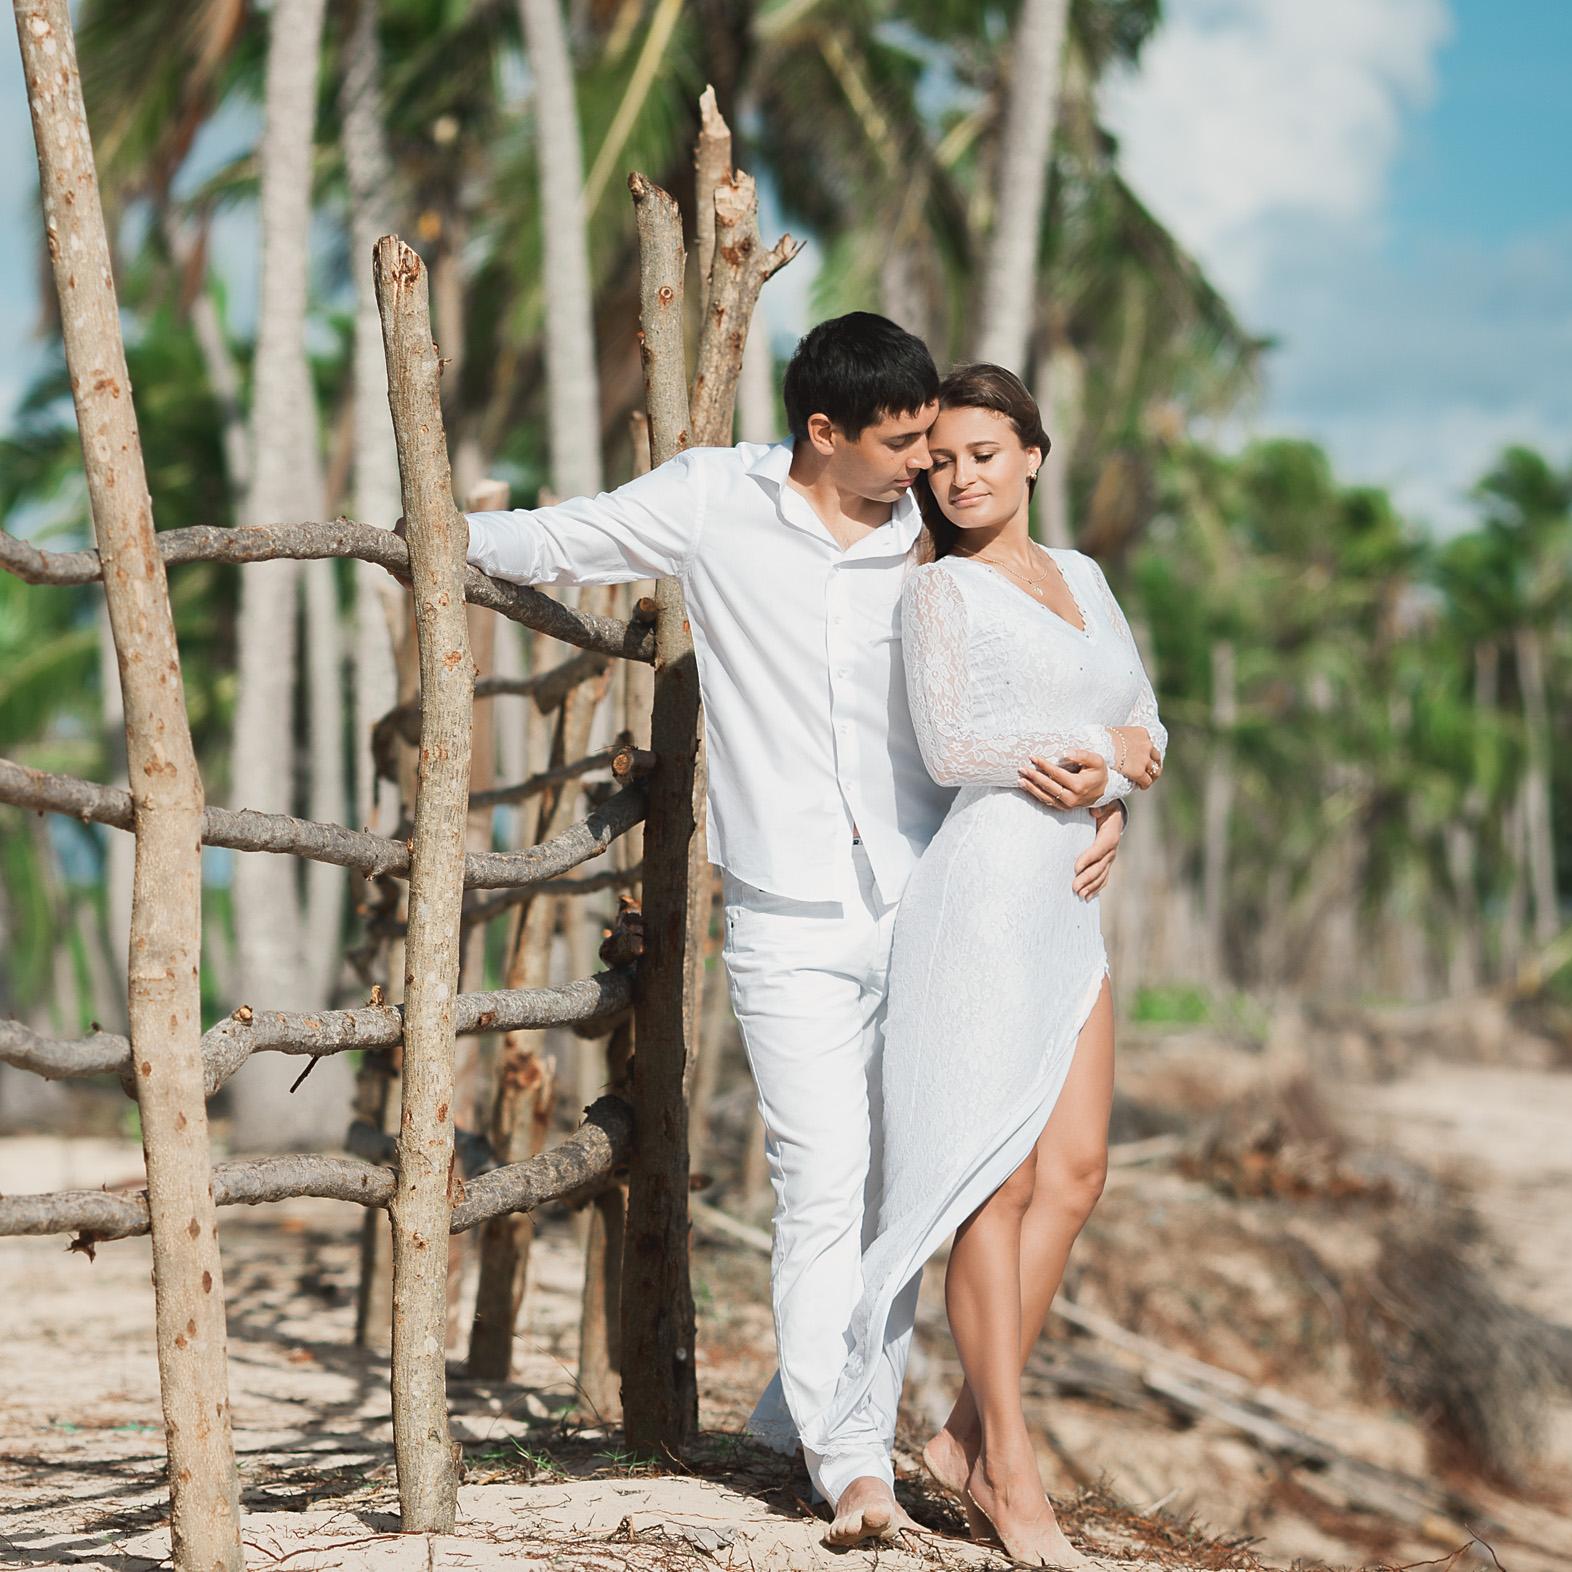 Свадебная фотосессия в Доминикане на пляже Макао Виктории и Азамата – WedDesign – Свадьба в Доминикане